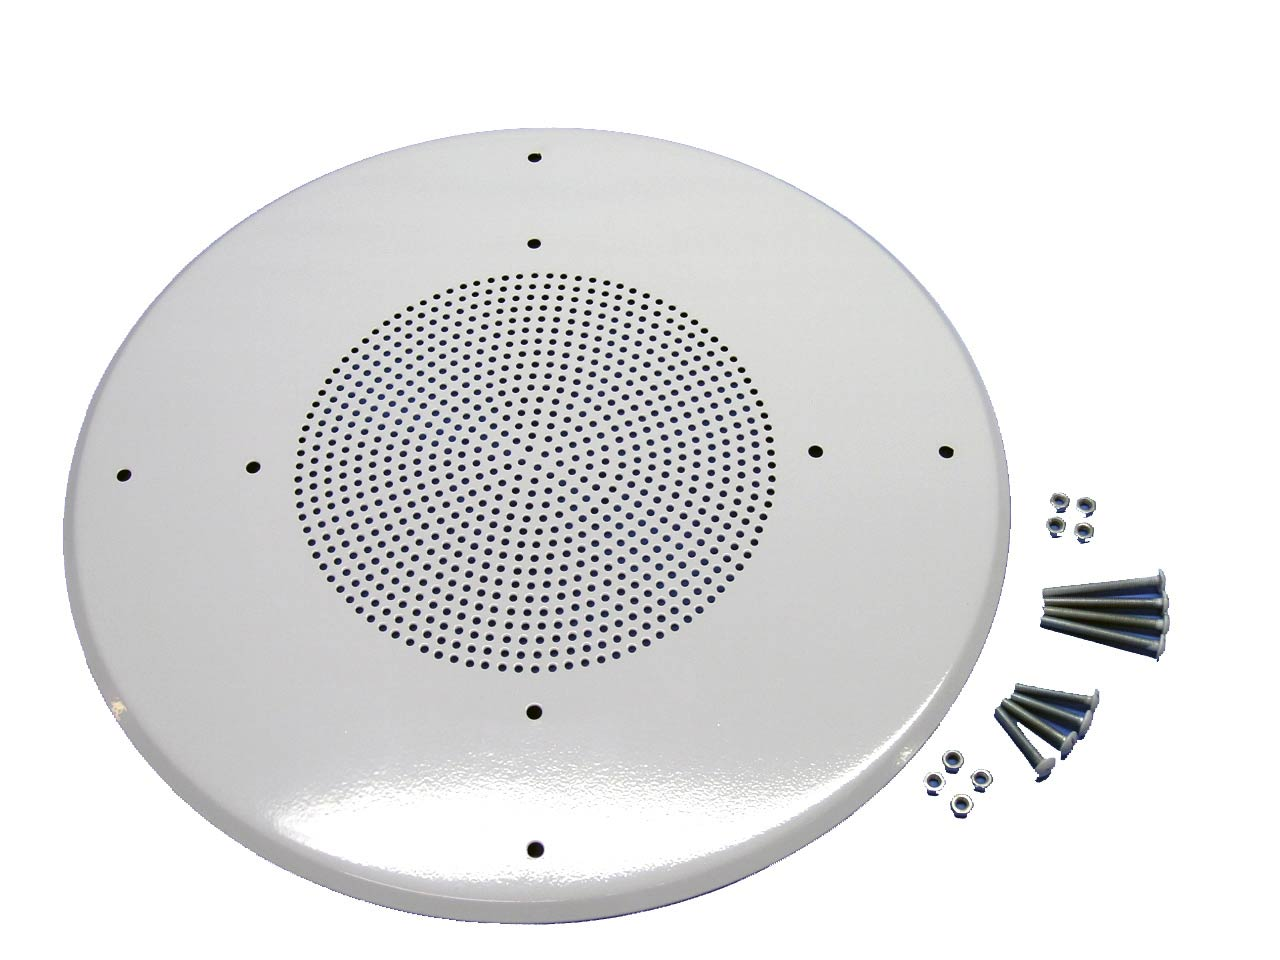 "12"" ceiling or wall metal speaker grill, flush mount, white finish"